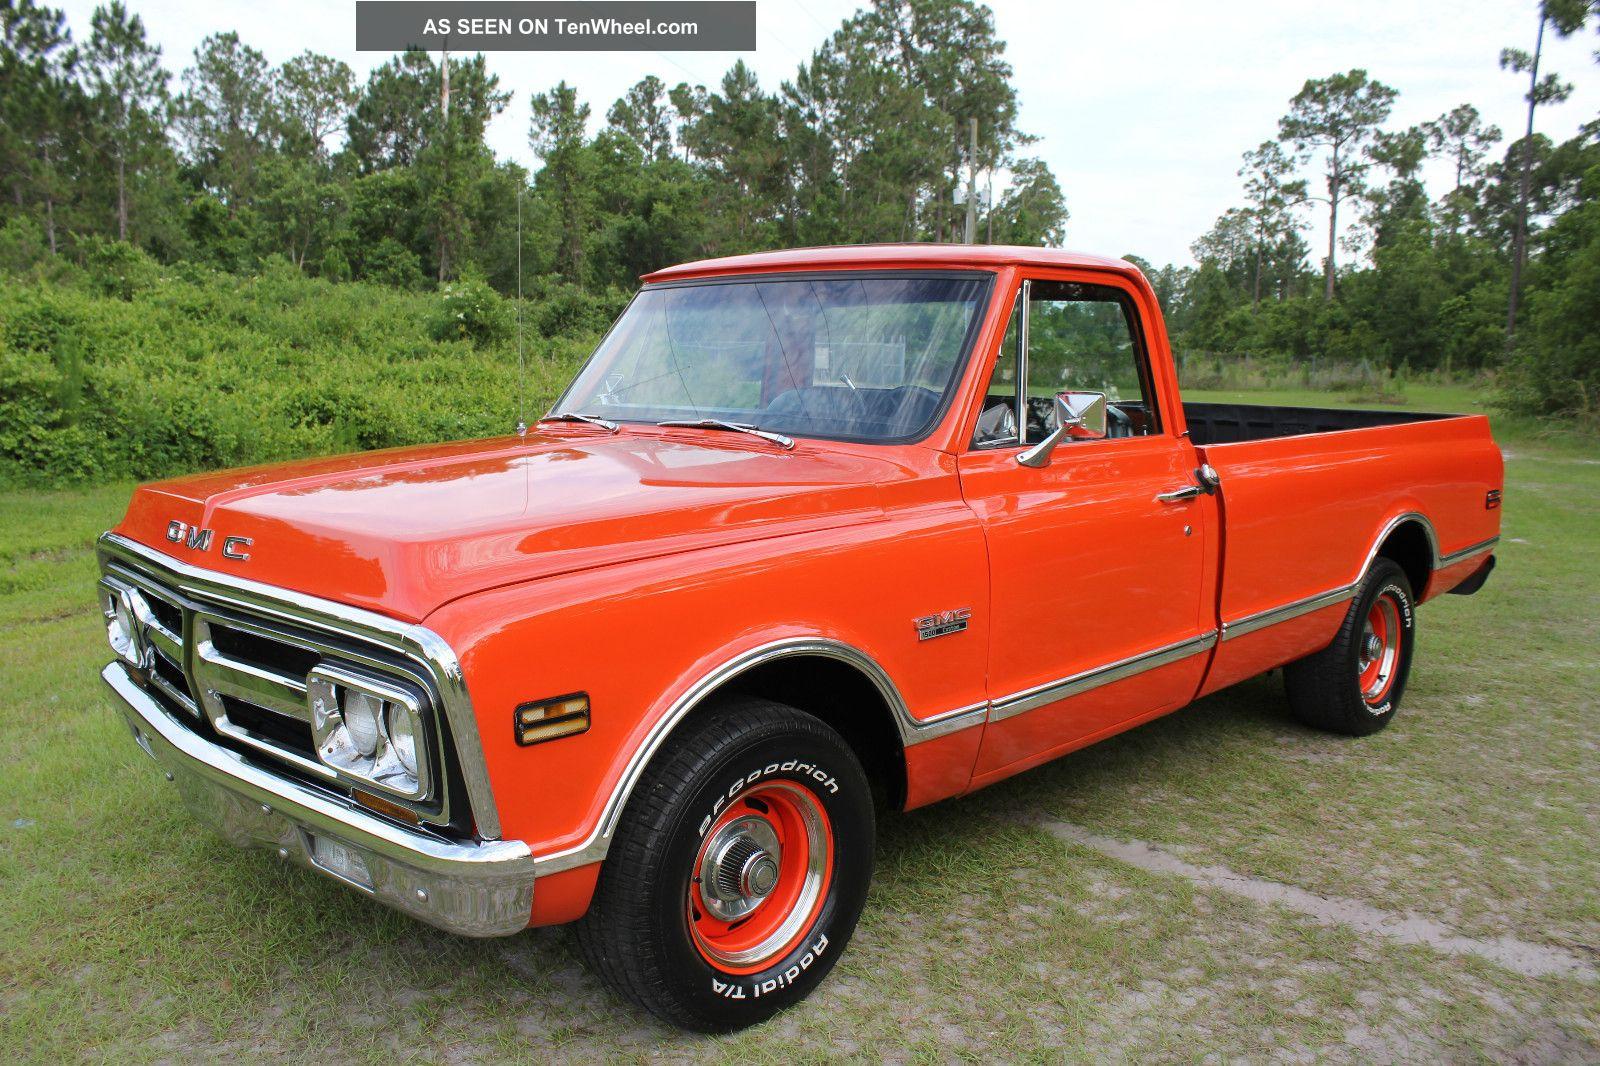 1971 Gmc 1500 Custom Pickup Truck General Motors Make Me An Offer